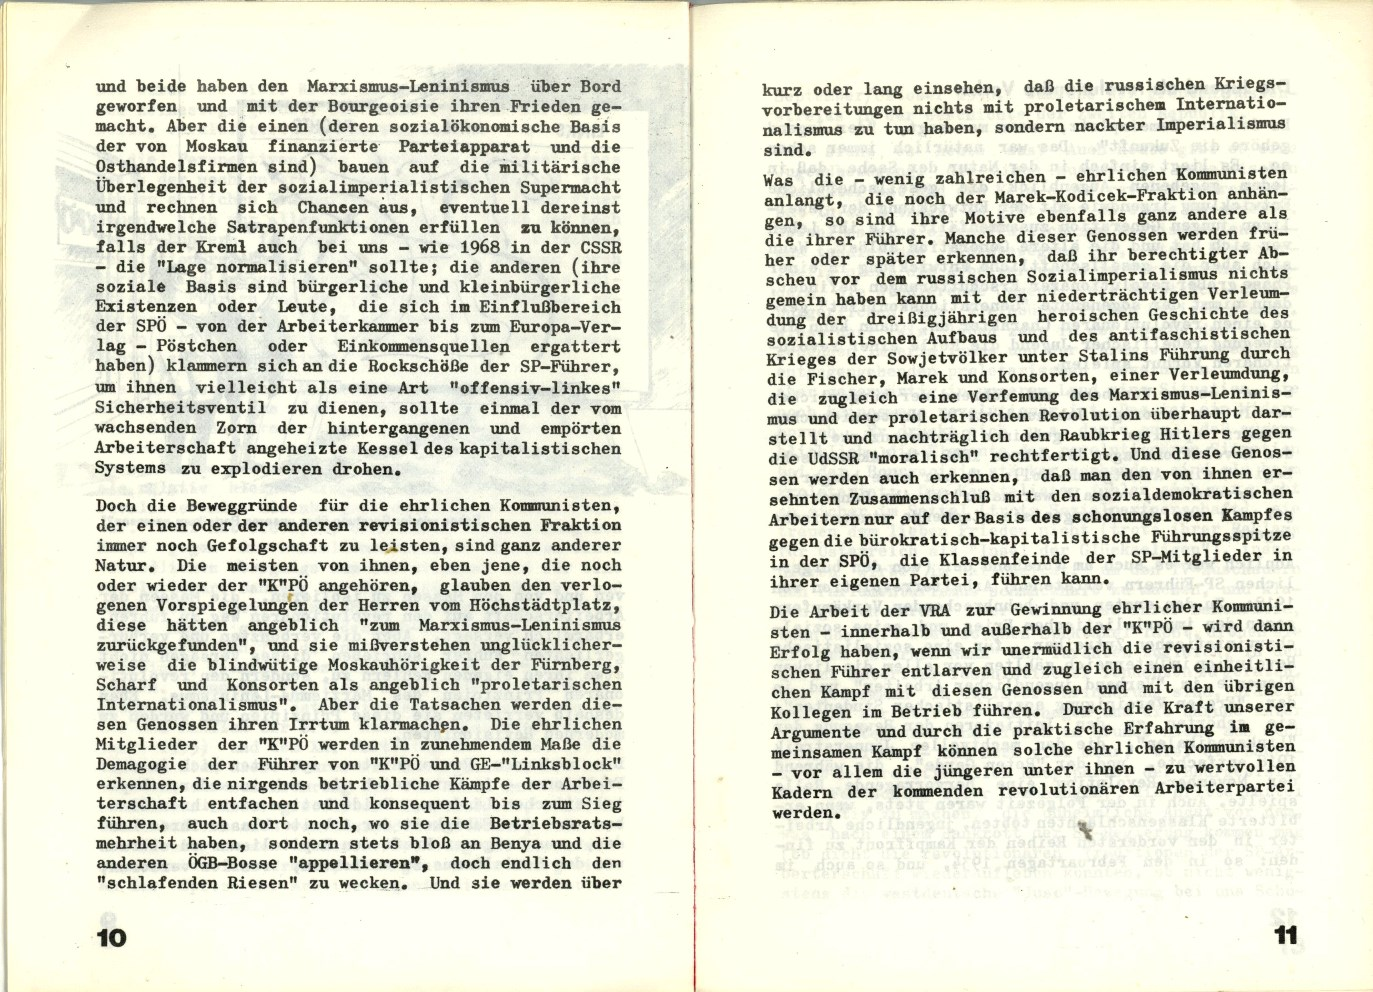 VRA_Perspektiven_1975_07